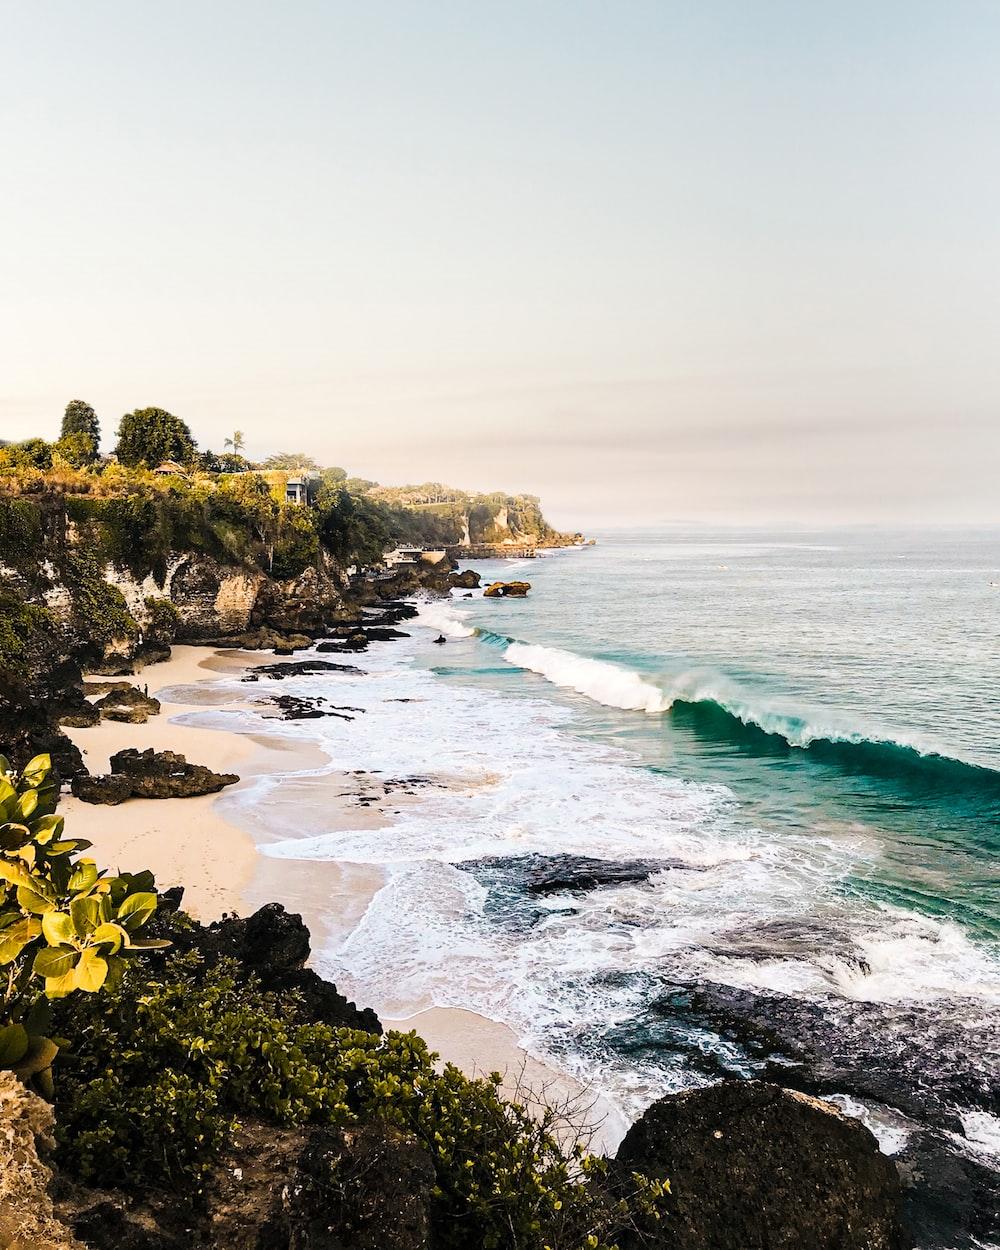 landscape photograph of beach